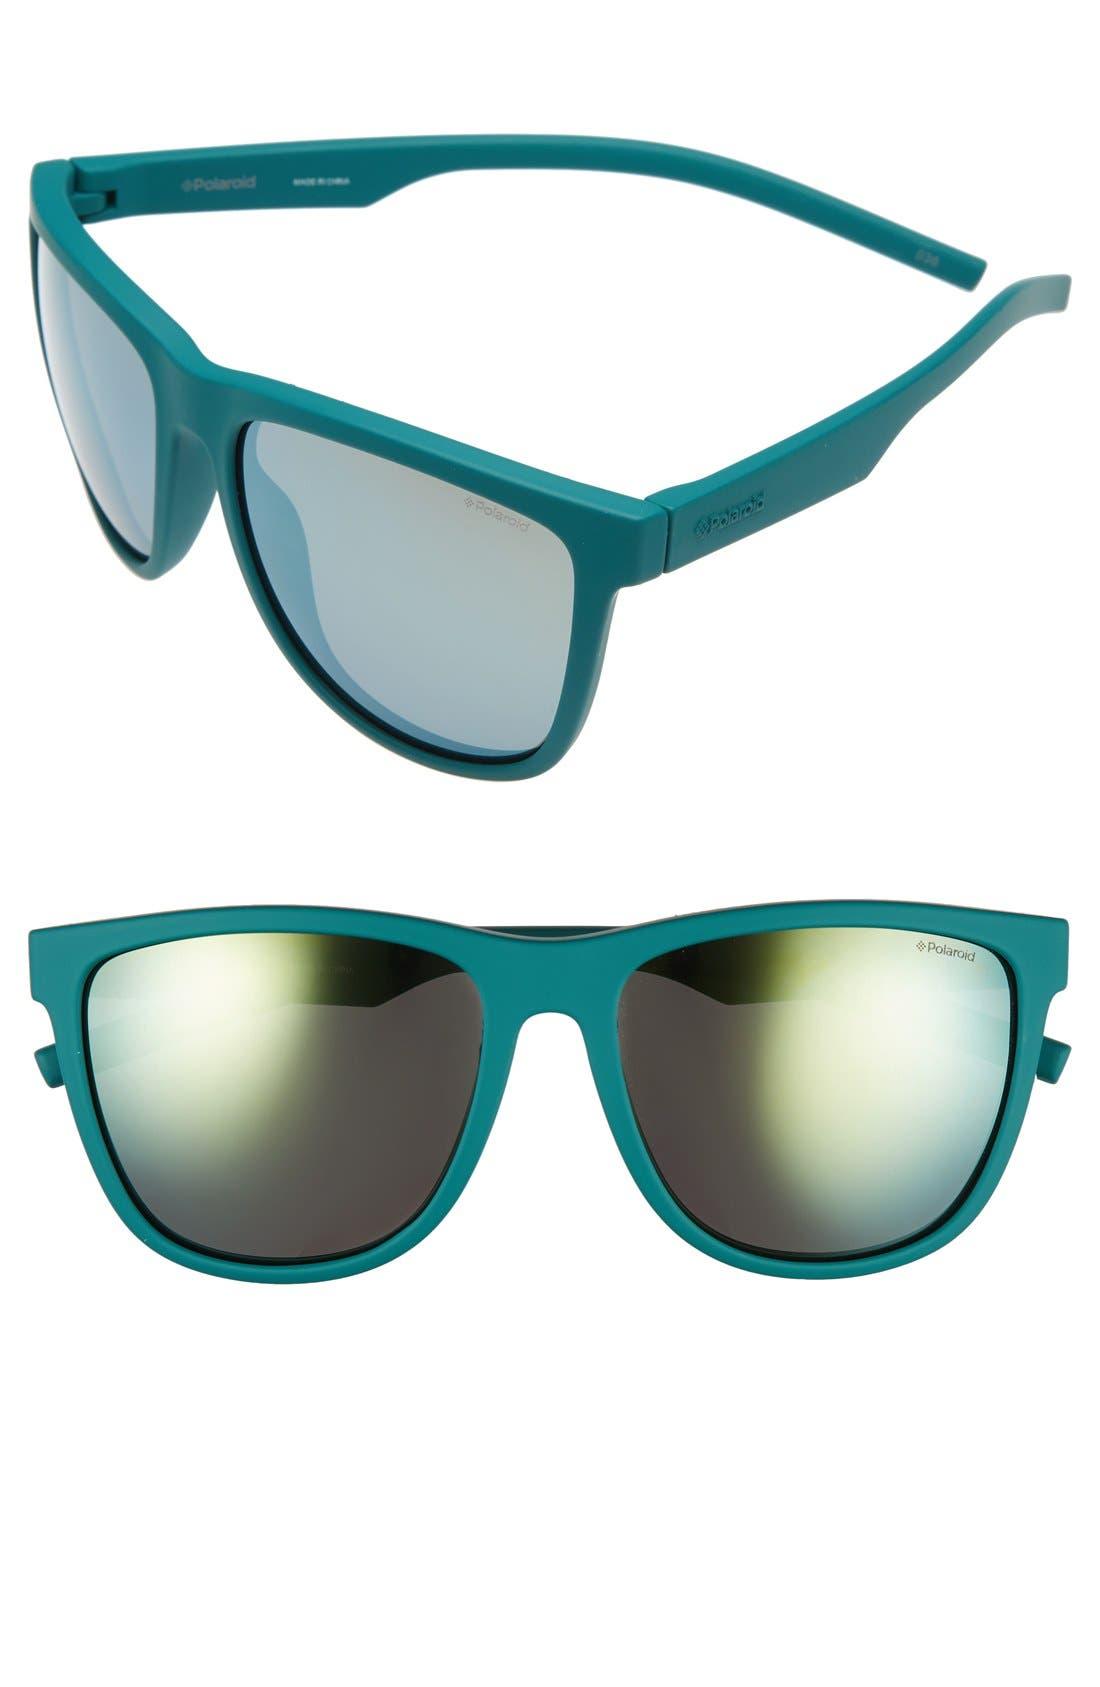 Polaroid 5m Retro Polarized Sunglasses -